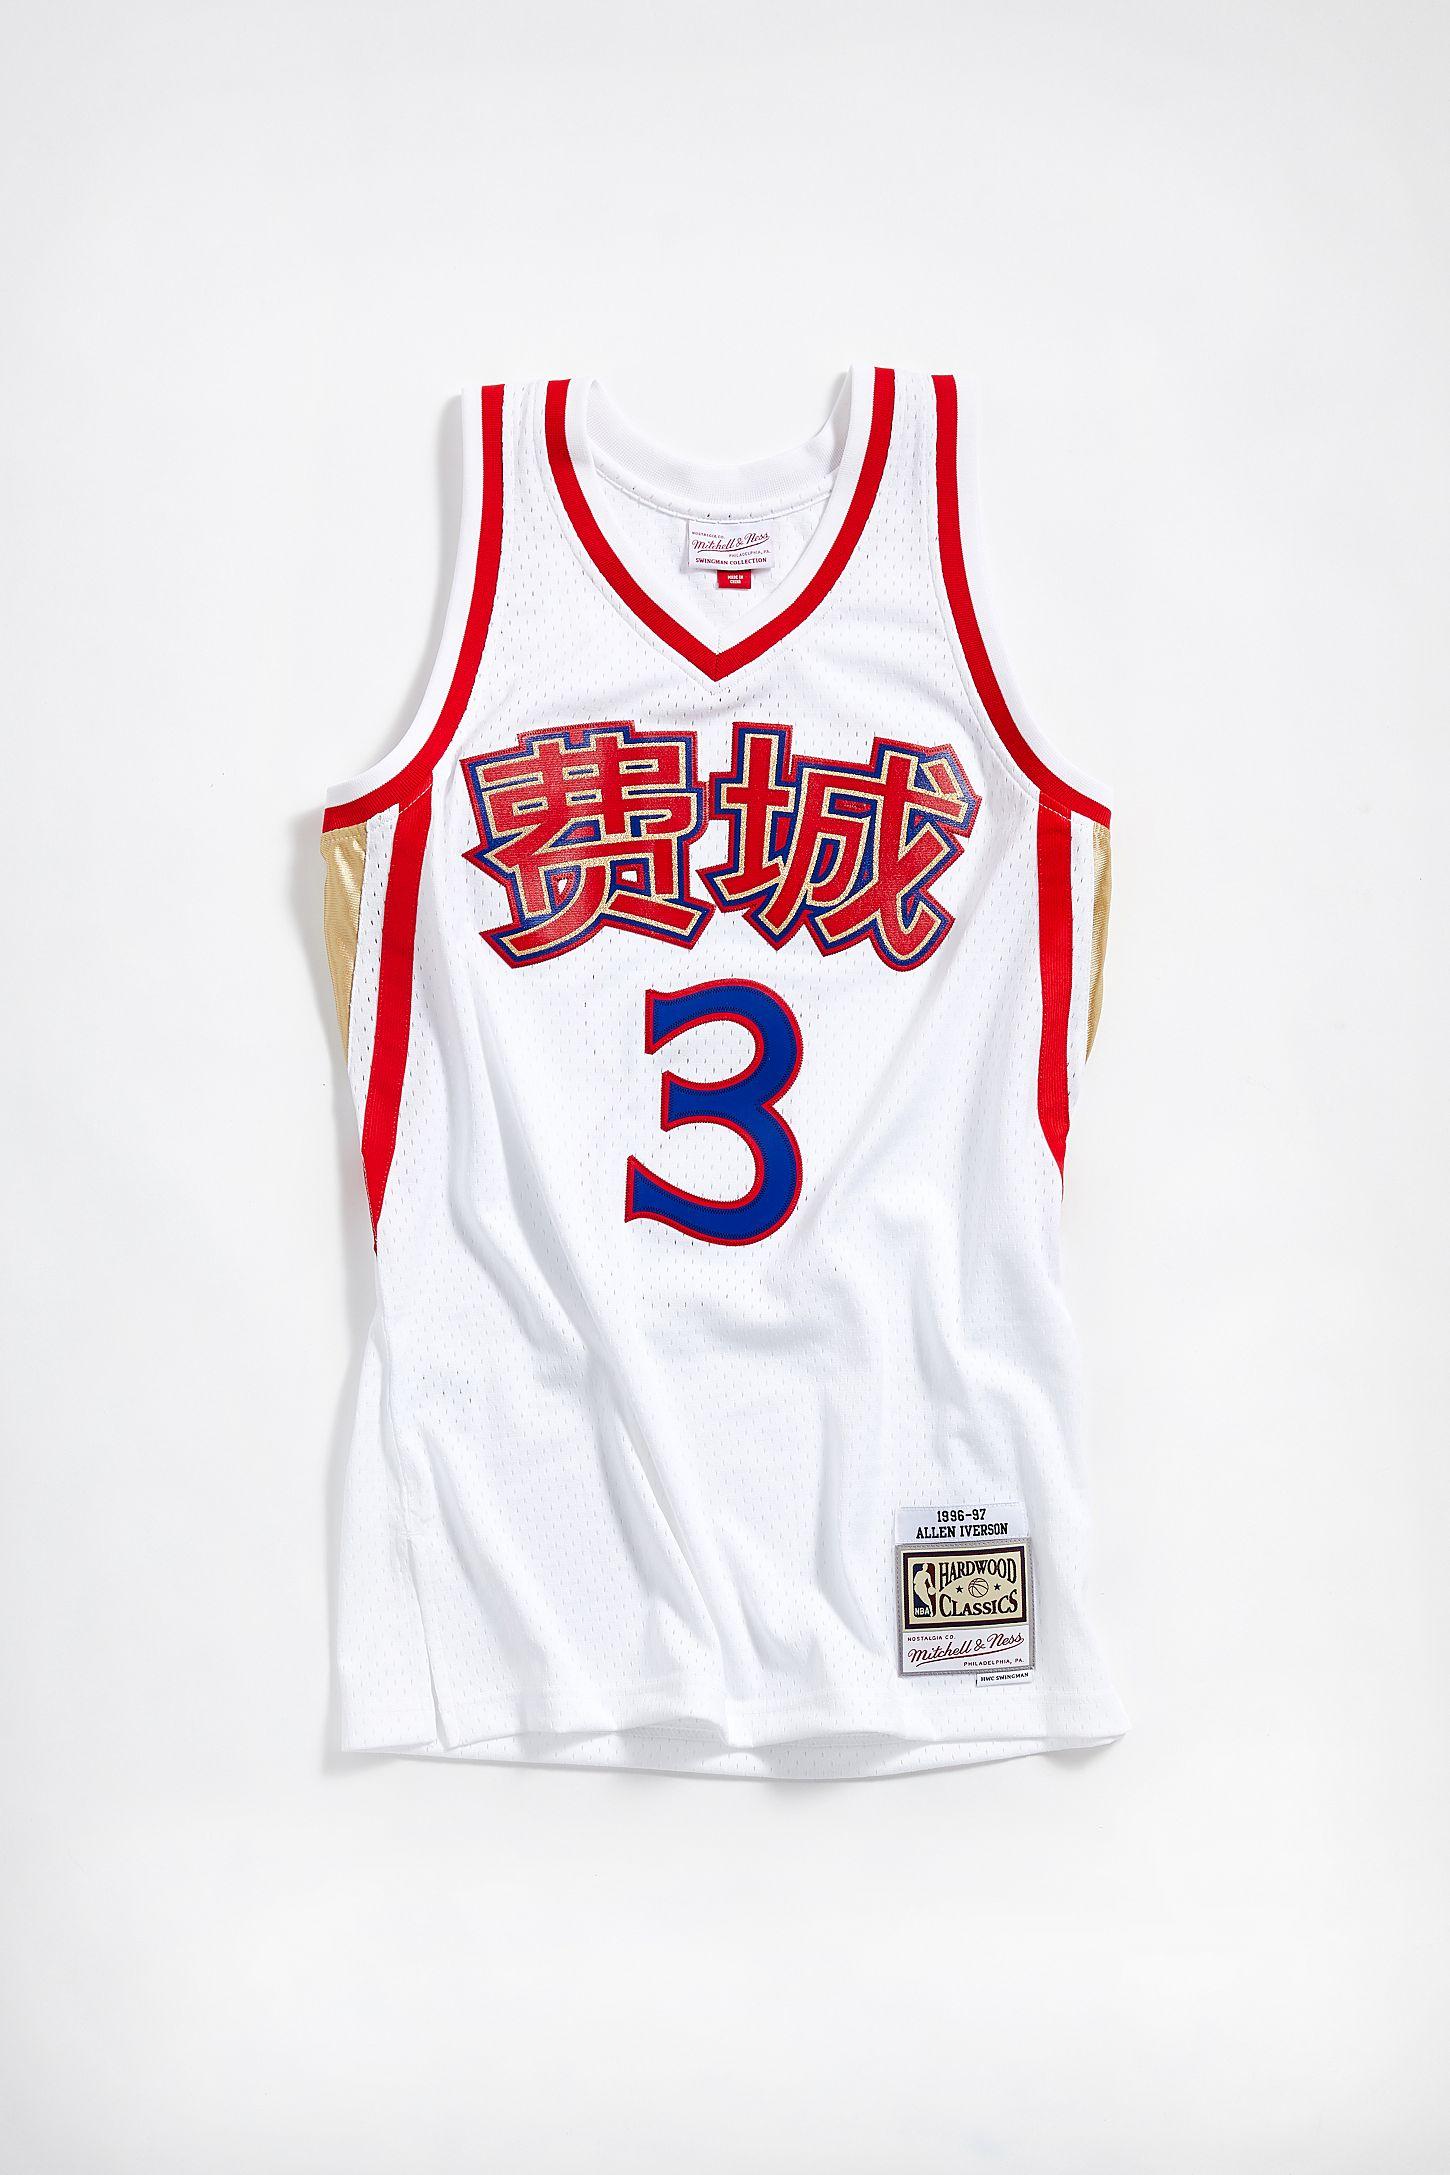 online retailer 97920 816dd Mitchell & Ness Chinese New Year Philadelphia 76ers Allen Iverson  Basketball Jersey